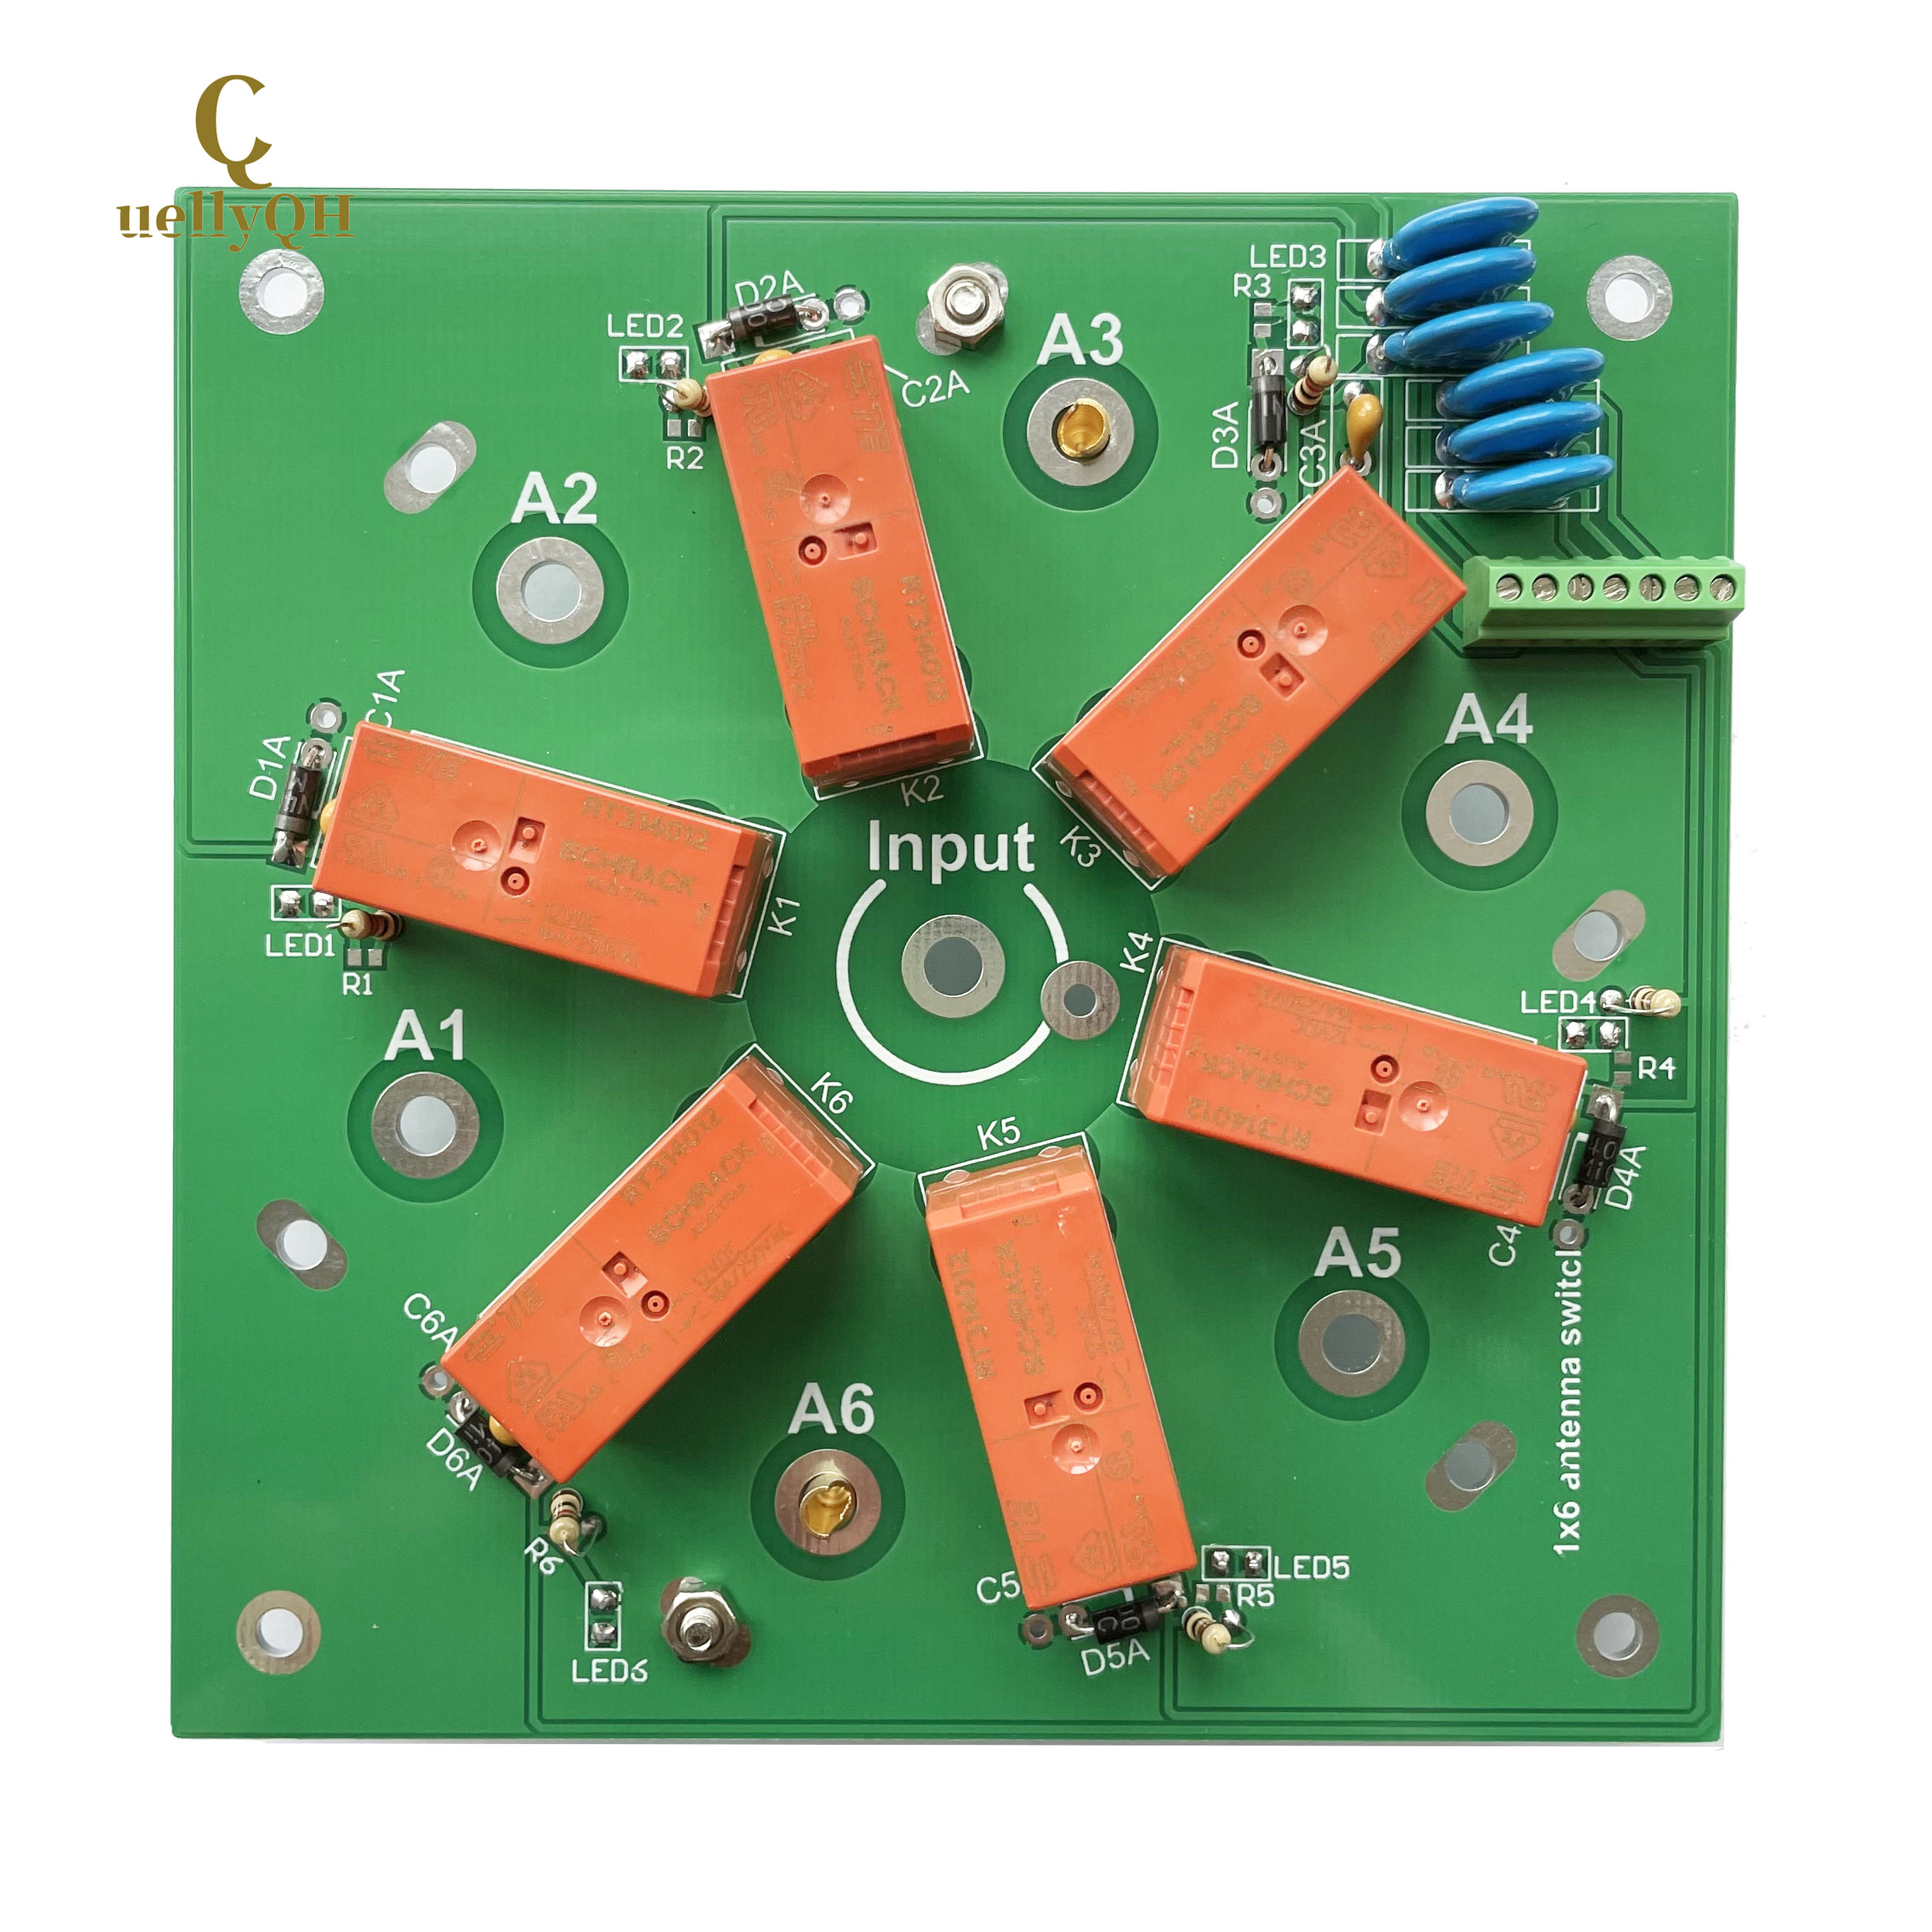 KIT 6:1 coax remote antenna switch SO-239 6-way 1.8-60MHz